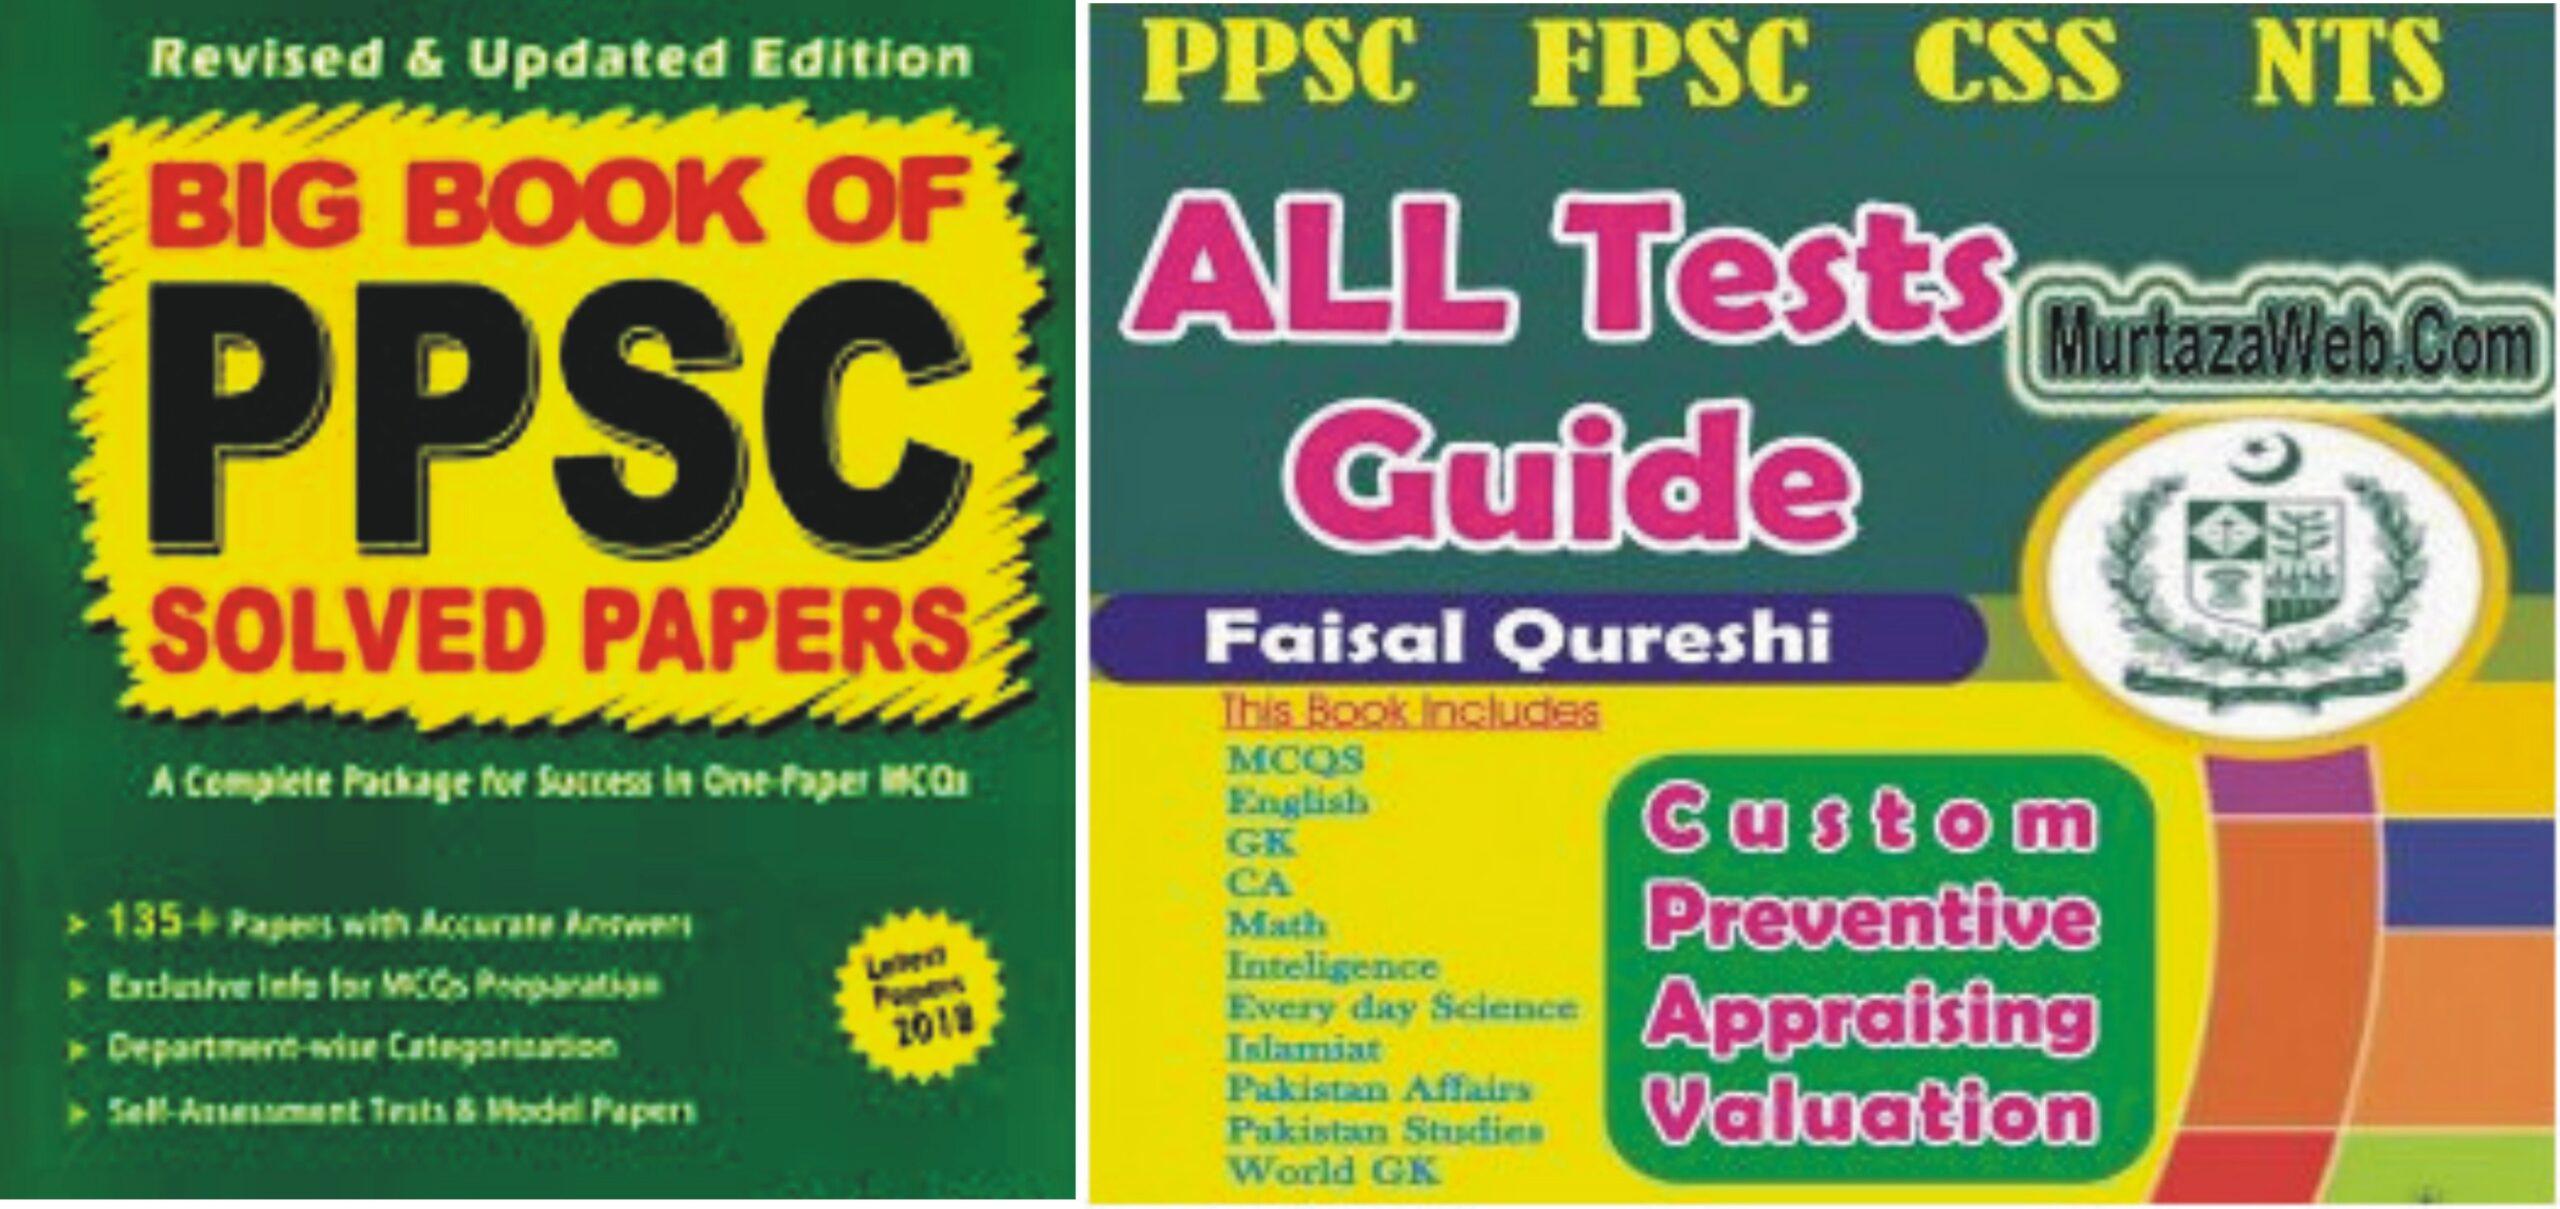 PPSC Guide Books Free Download 50 Plus Books 2019 Latest